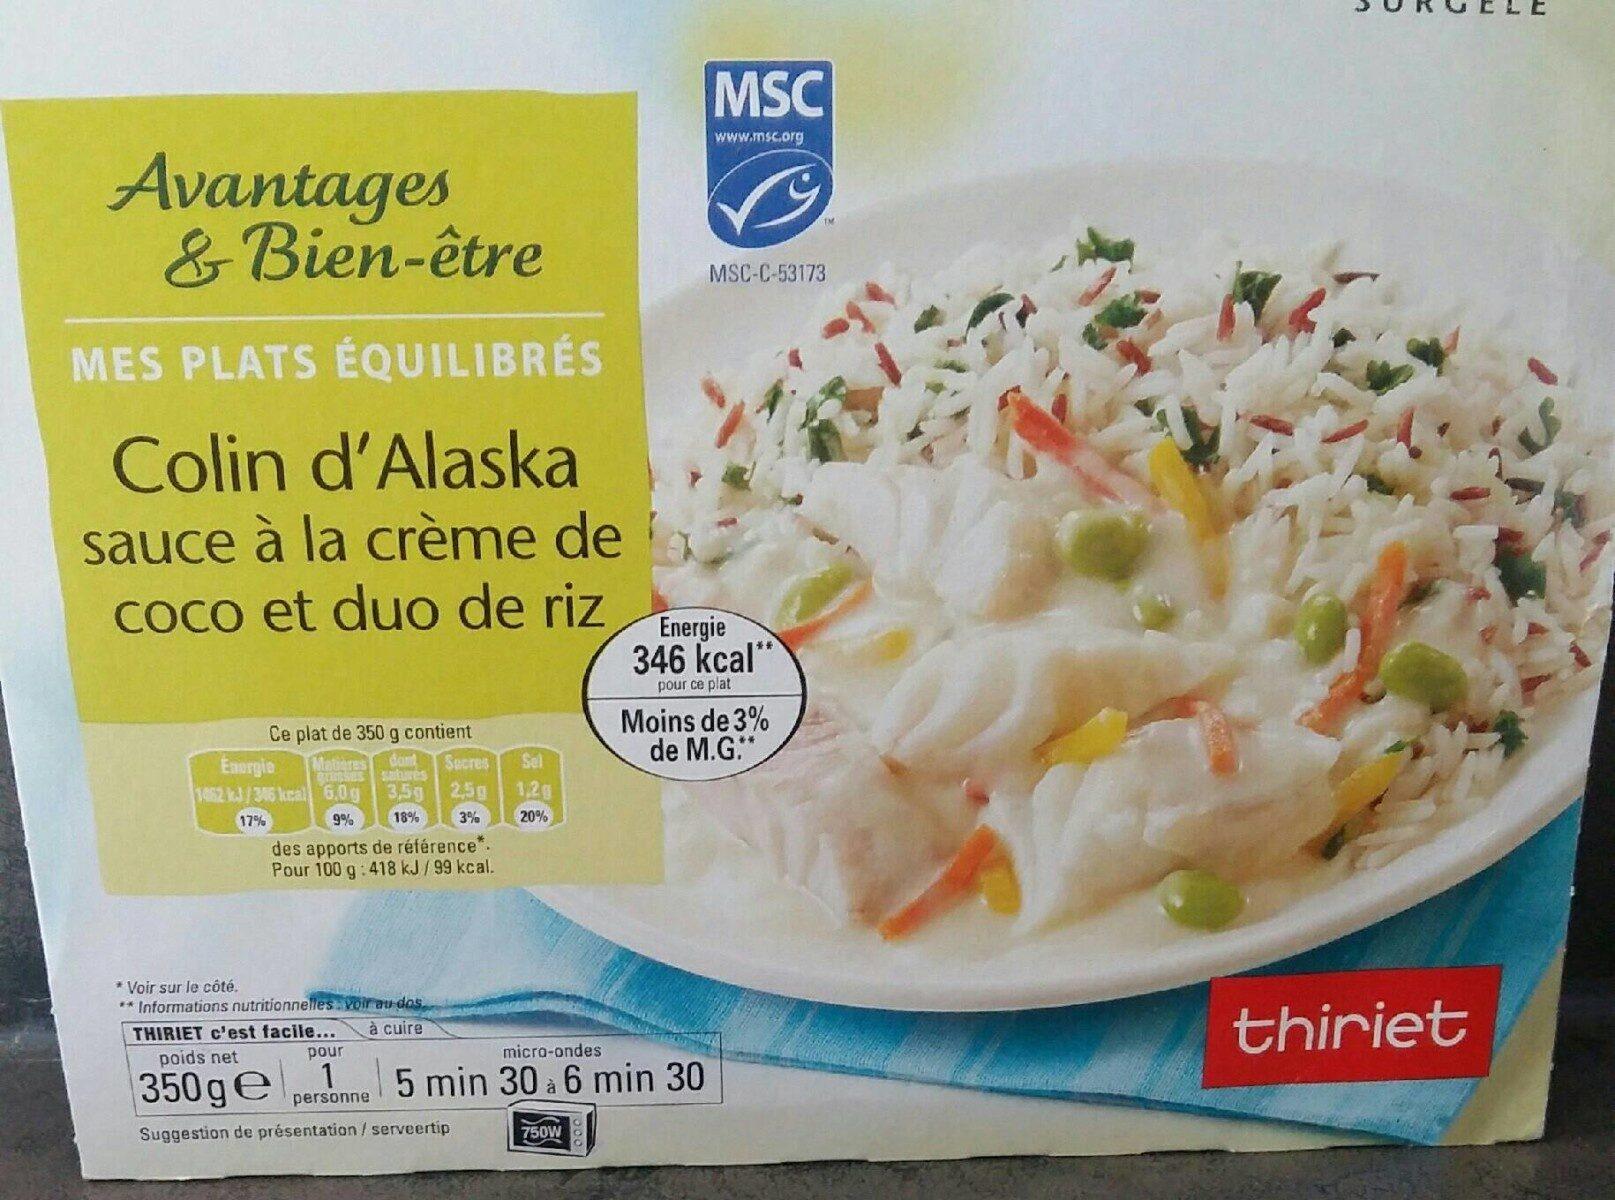 Colin d'Alaska sauce crème de coco et duo de riz - Prodotto - fr